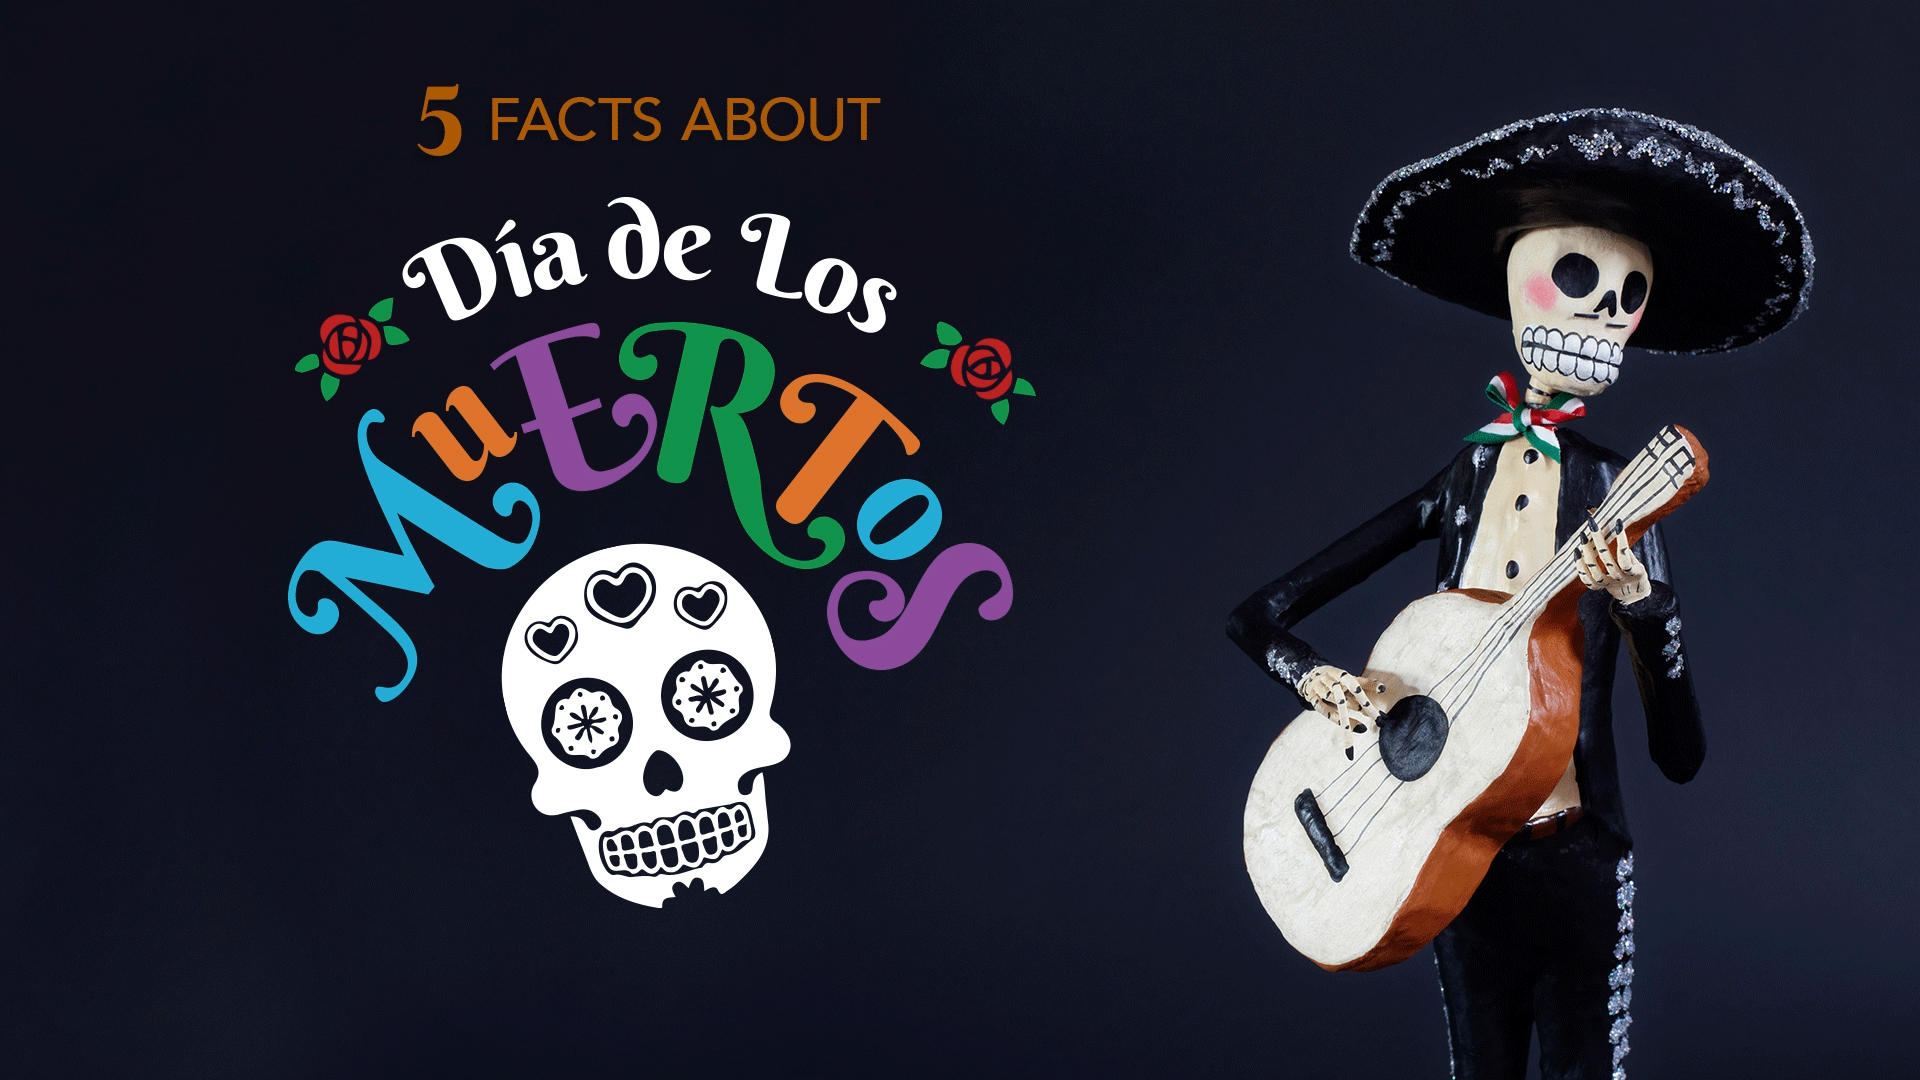 5 facts about dia de los muertos  day of the dead